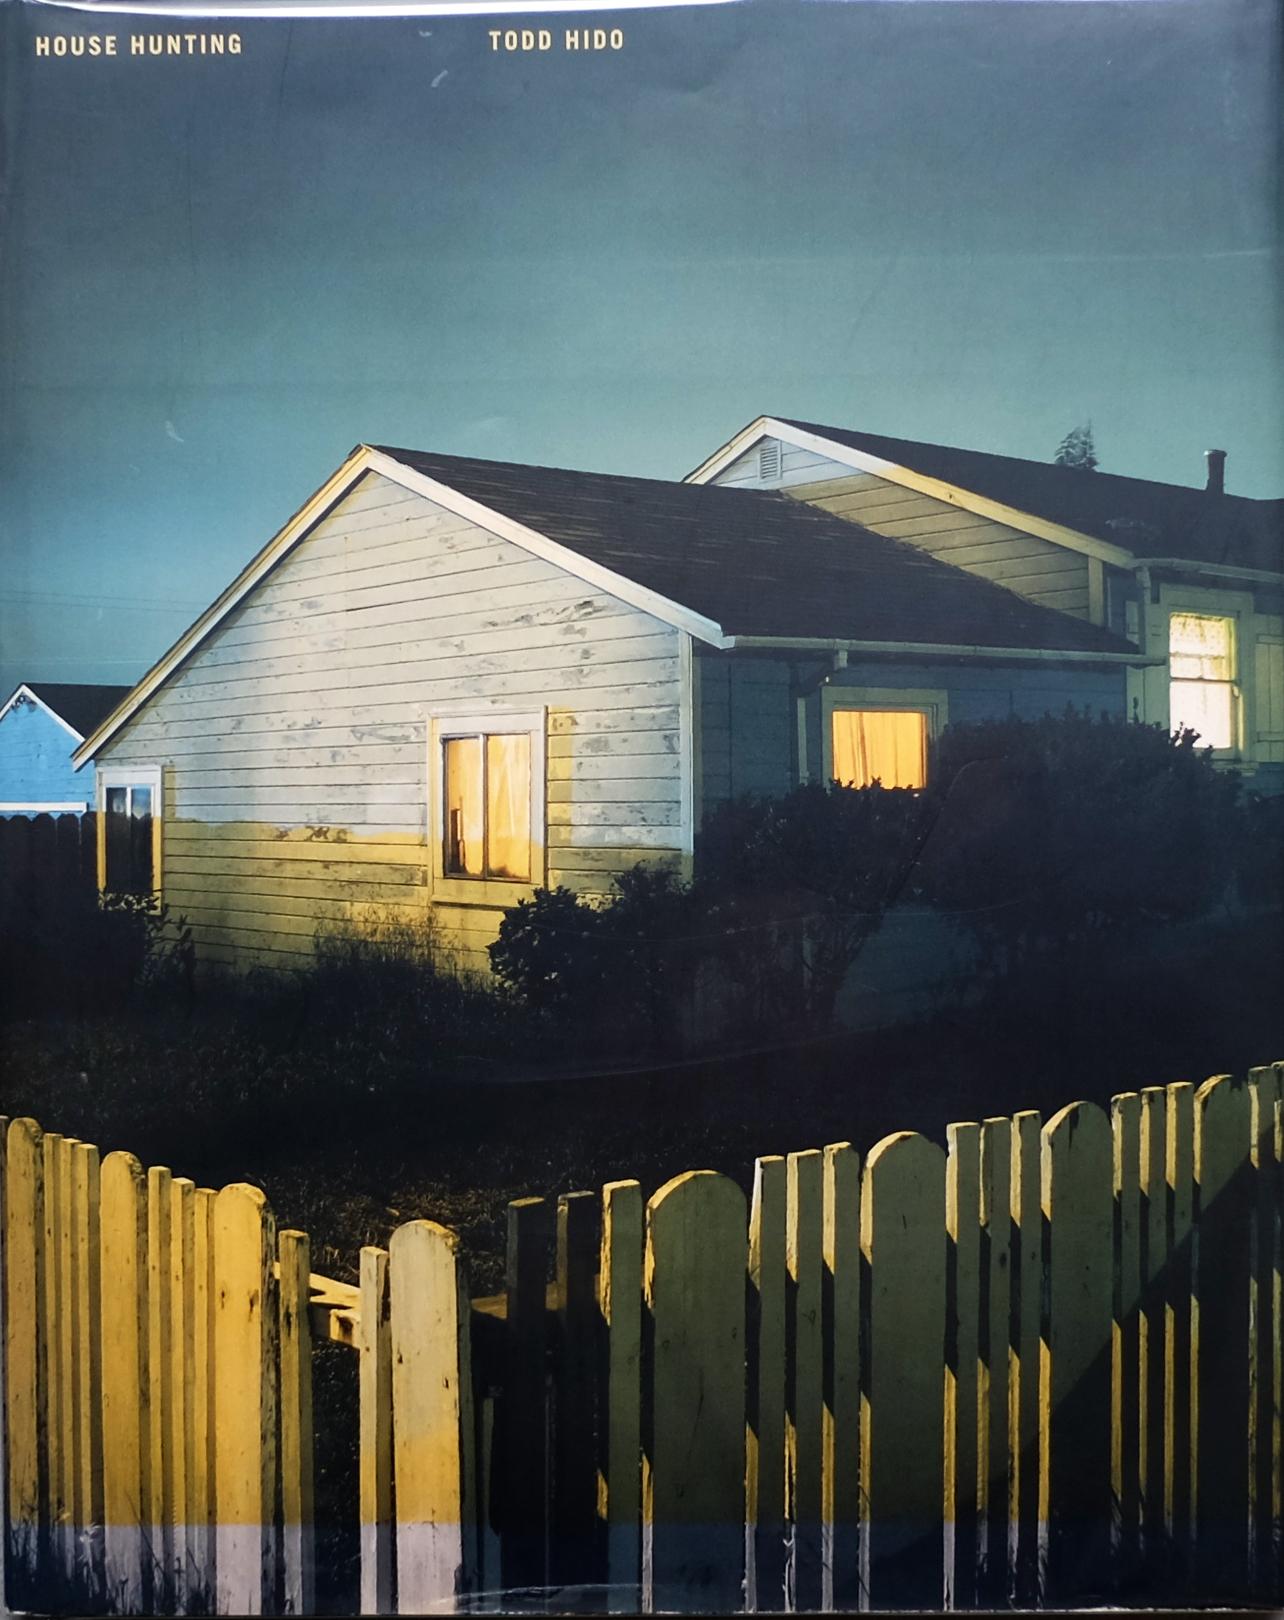 Todd Hido: House Hunting